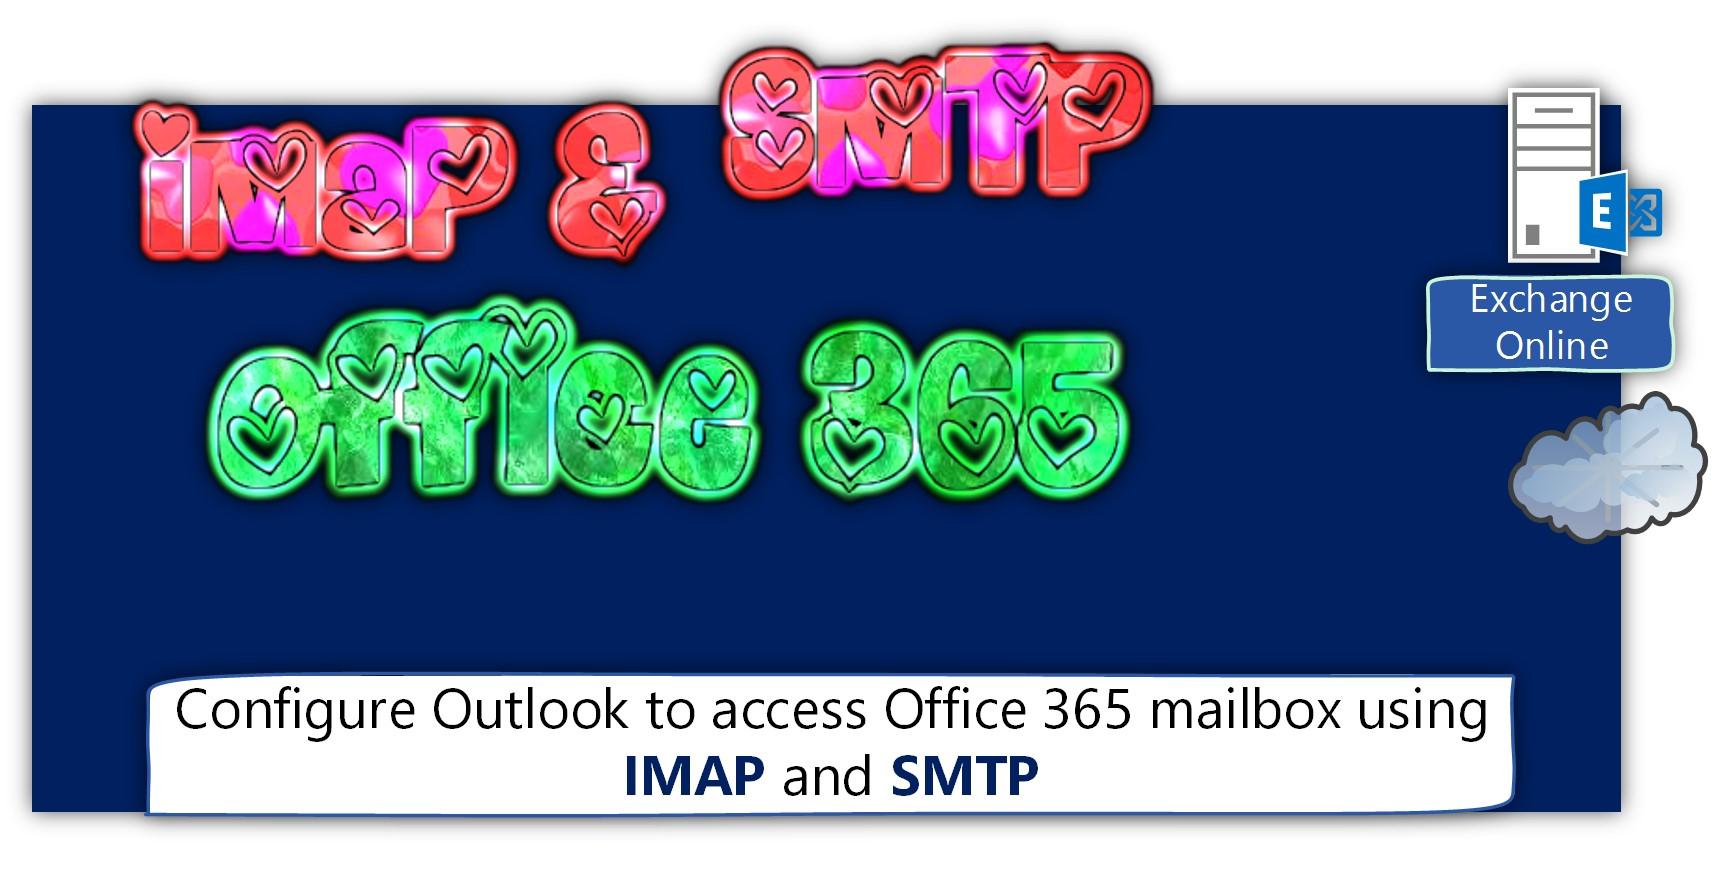 IMAP, SMTP, Outlook | Configure Outlook to access Office 365